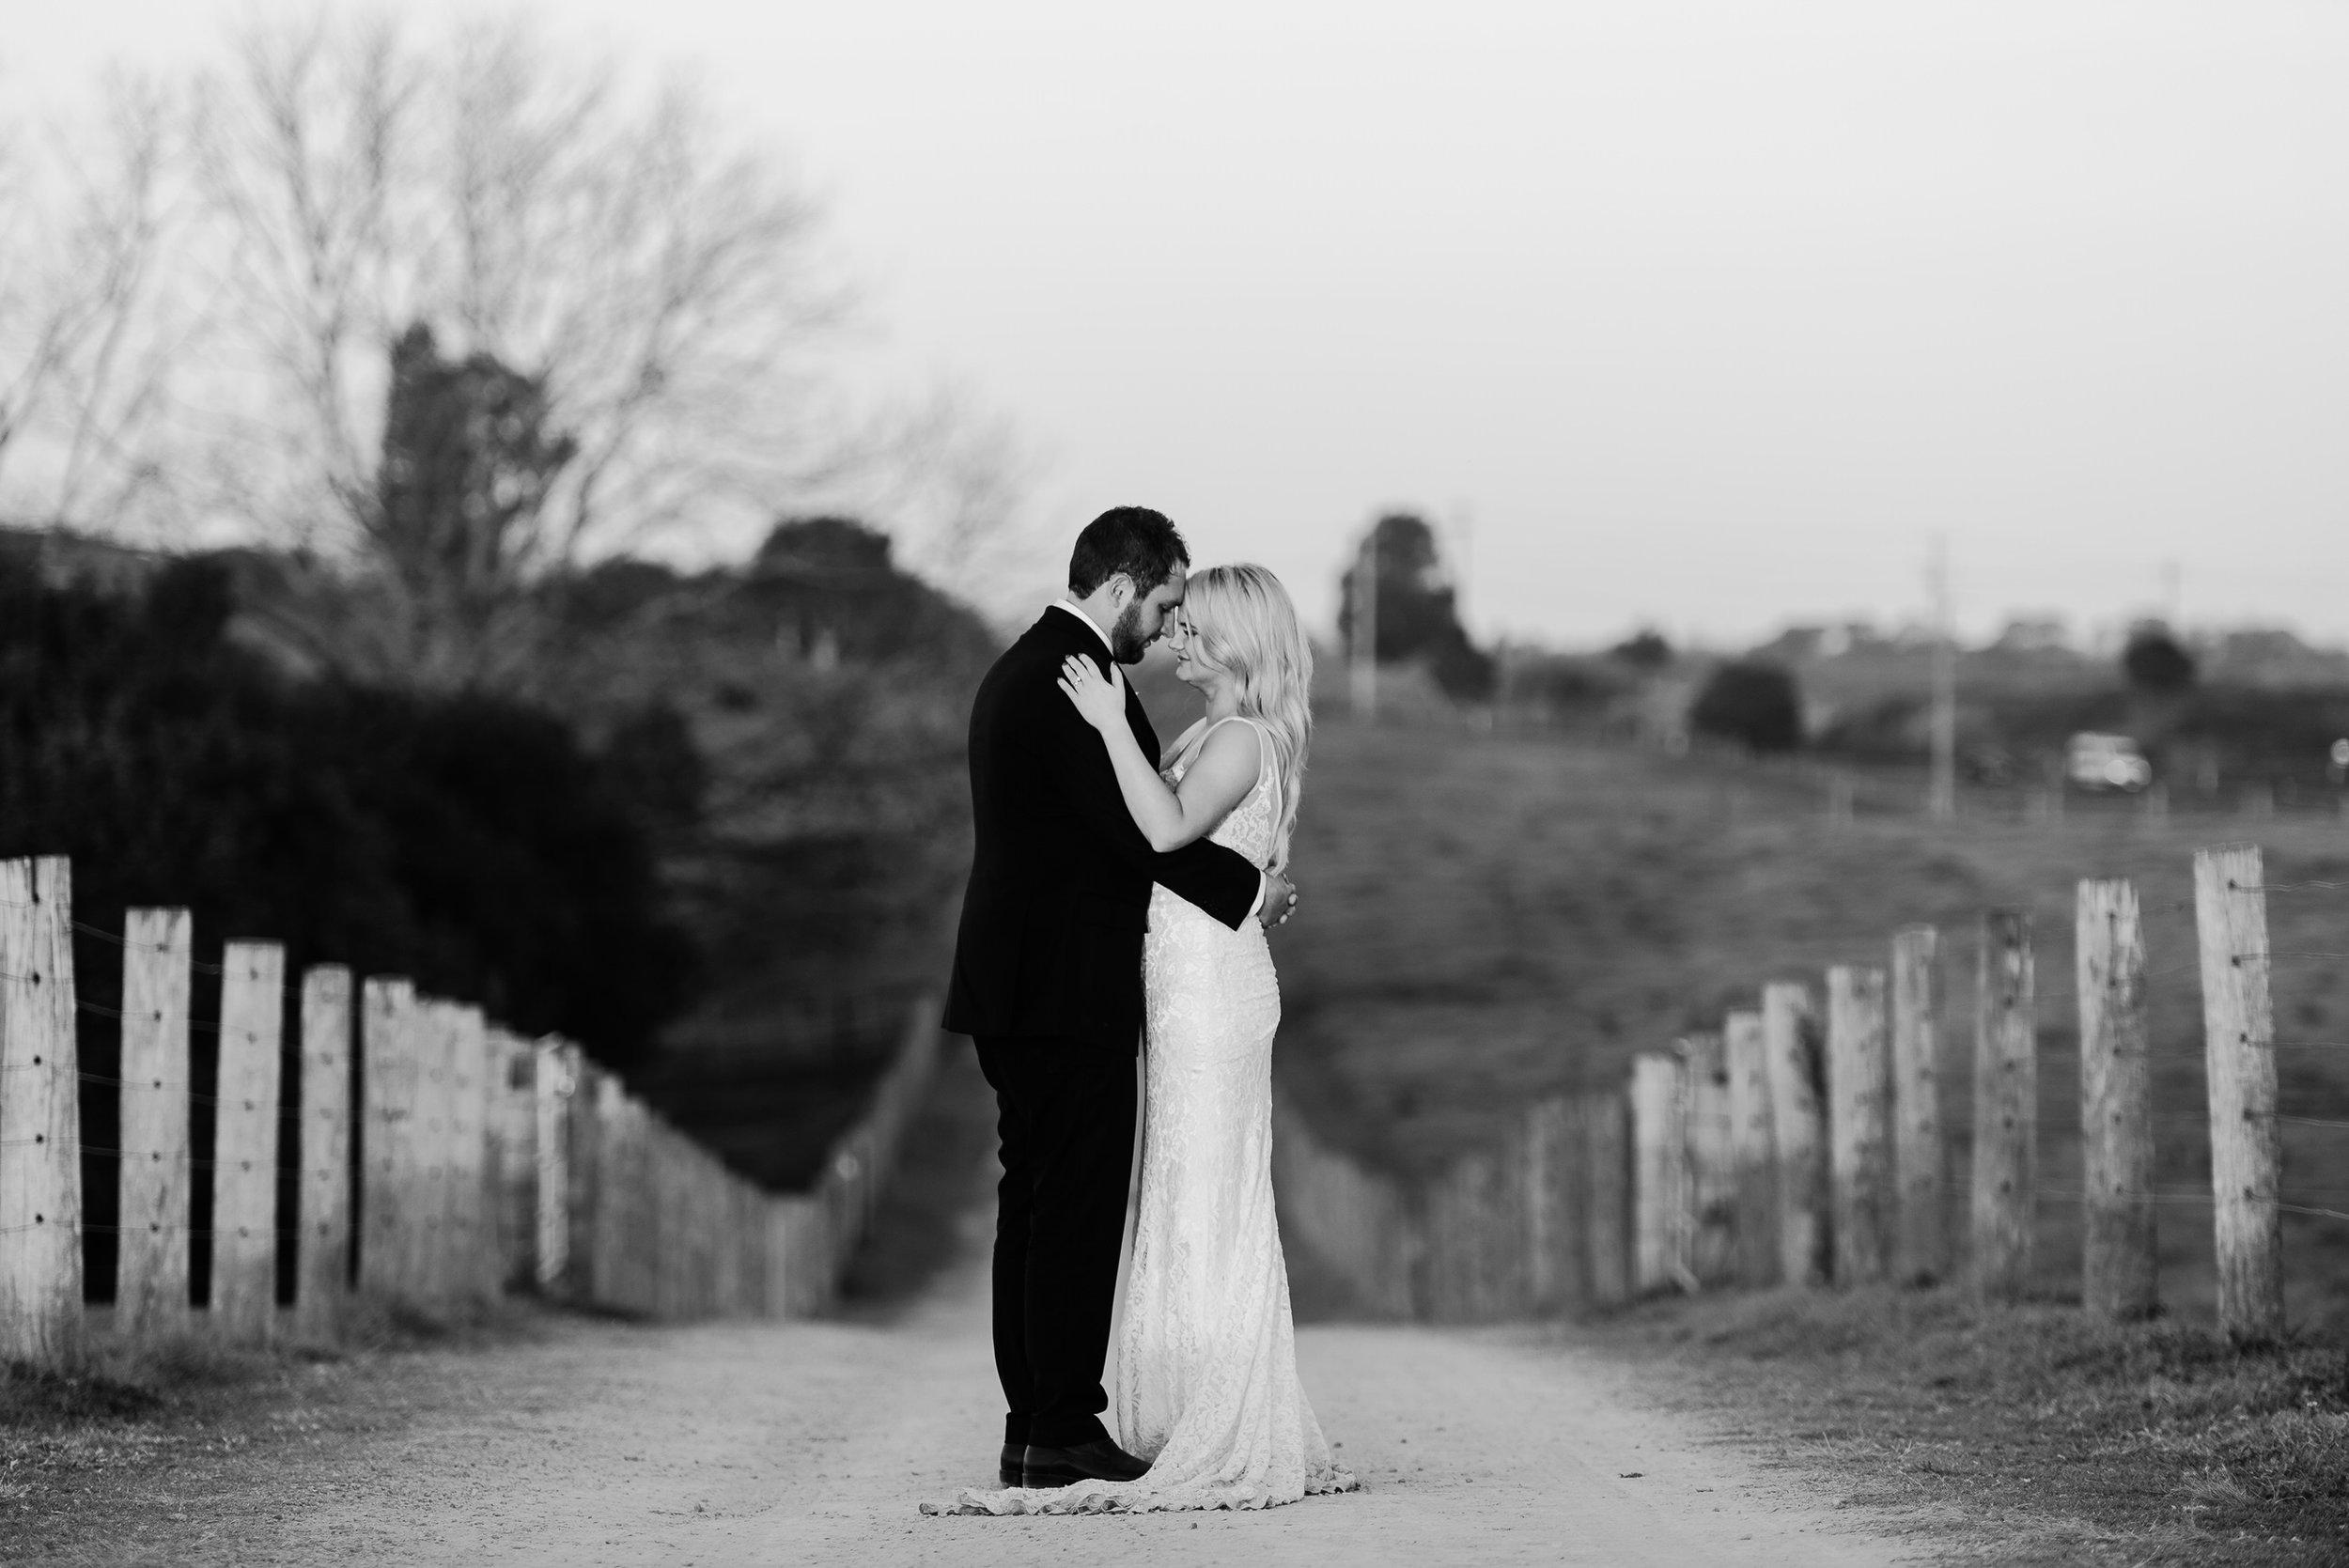 Justin_And_Jim_Photography_Byron_Bay_Wedding086.JPG